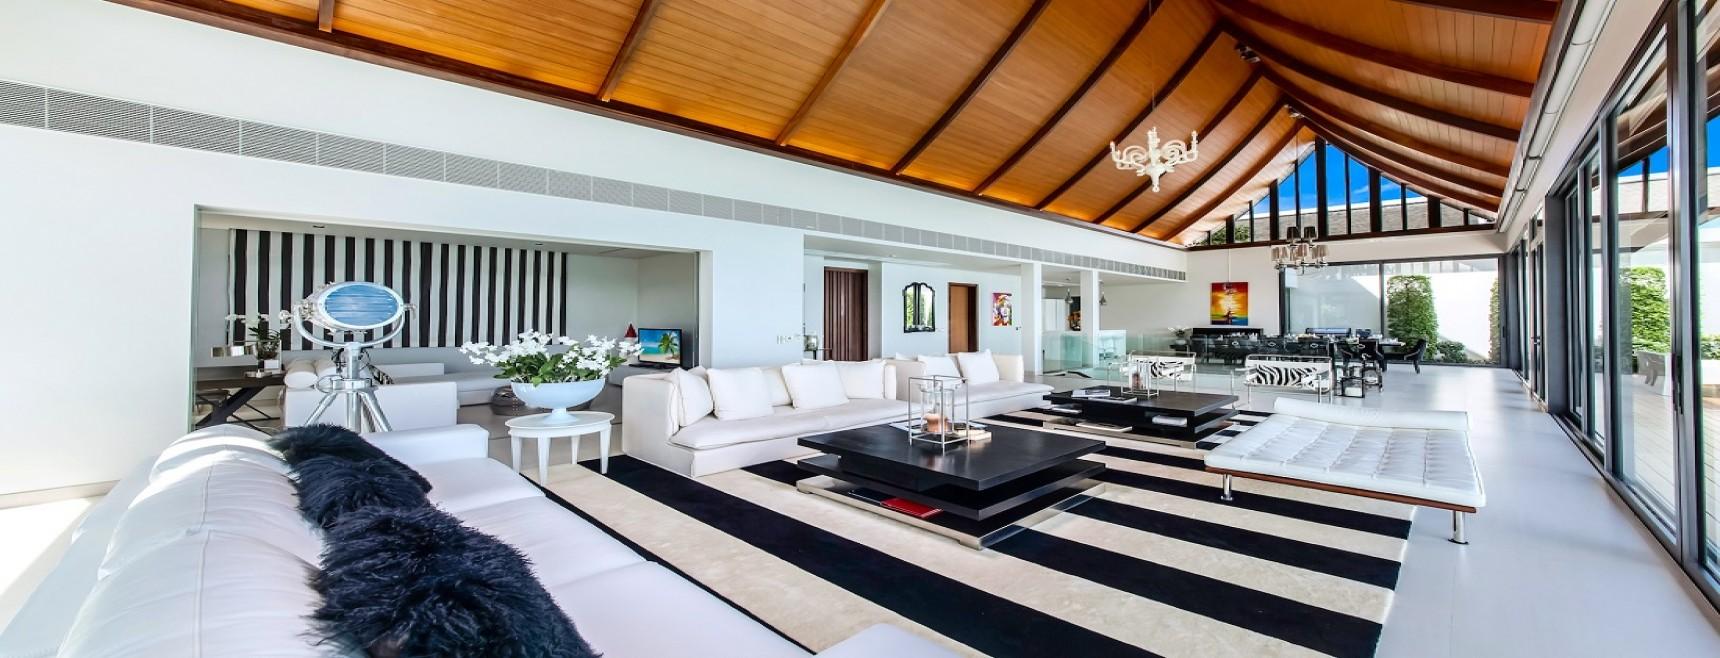 5 Bedrooms, Villa, Residential Sales, 6 Bathrooms, Listing ID 1477, North East, Phuket,